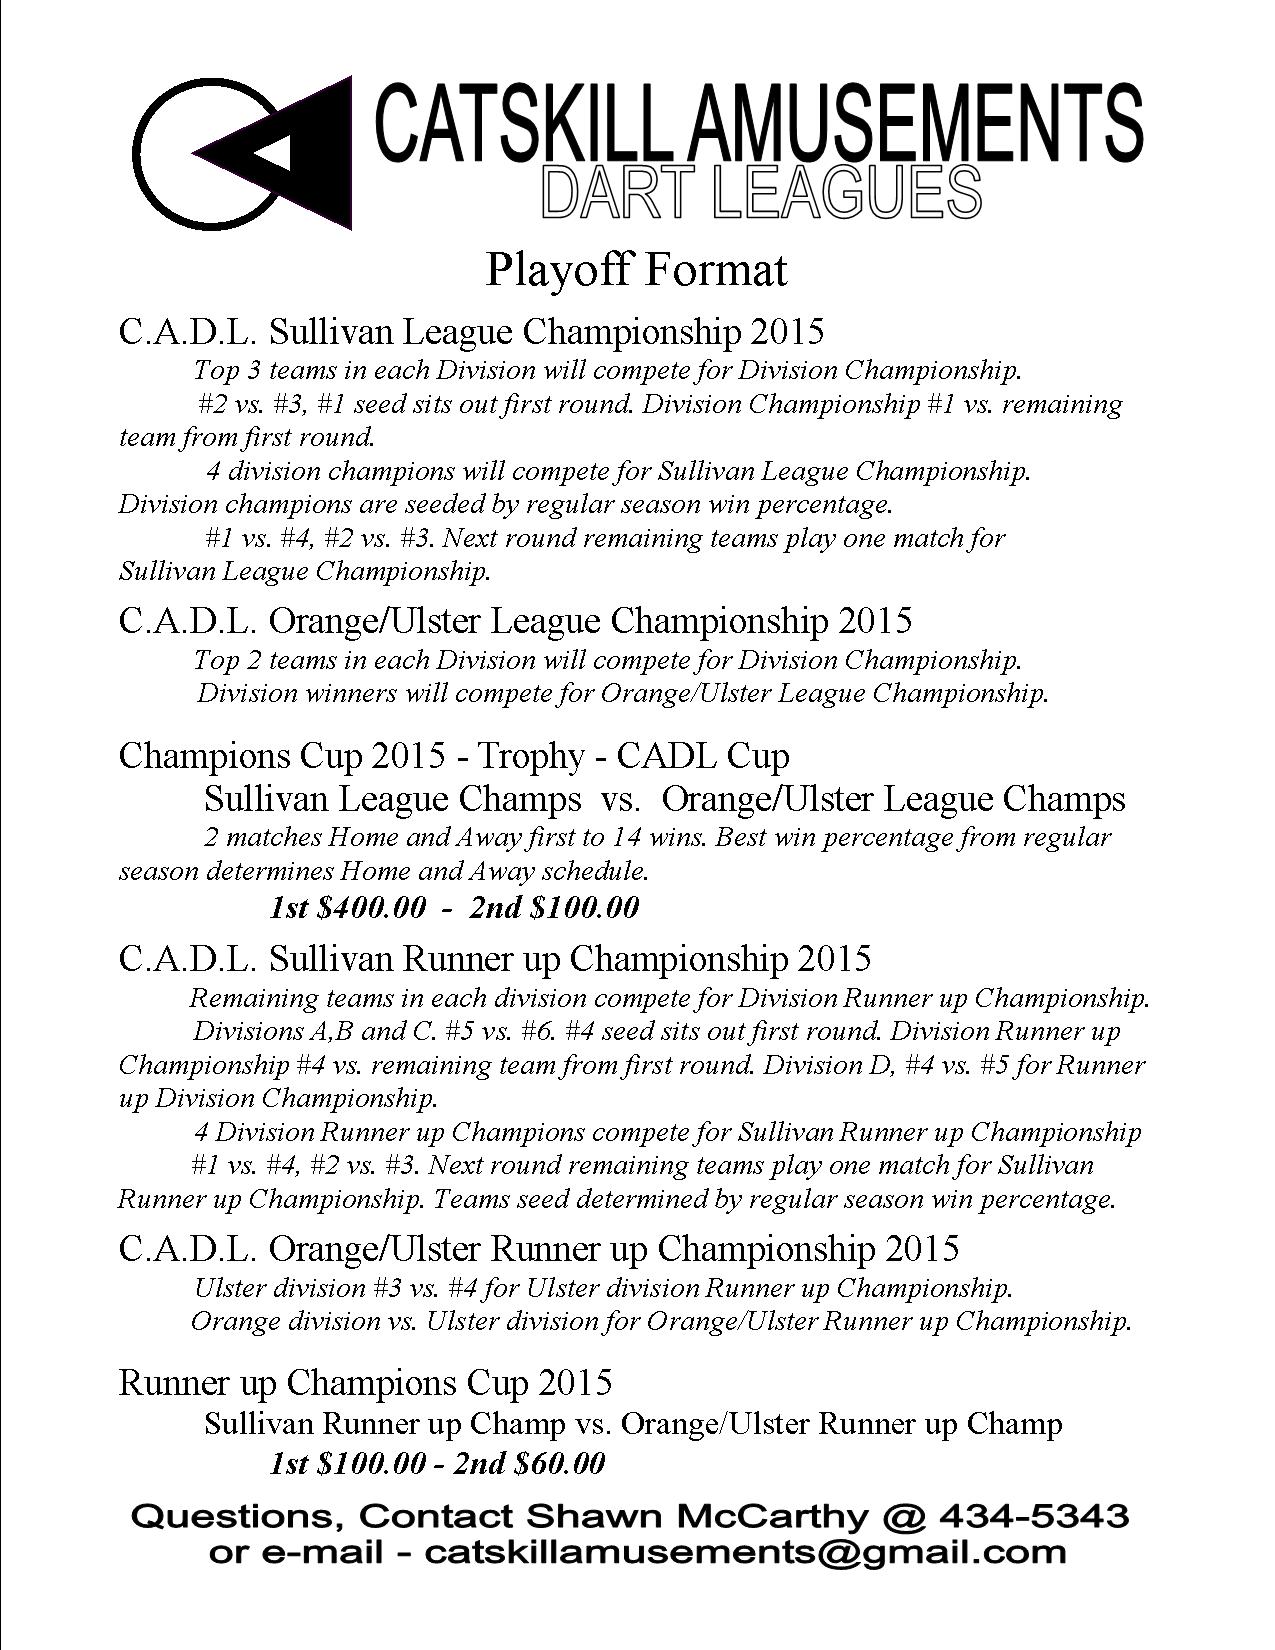 Playoff Format 2015